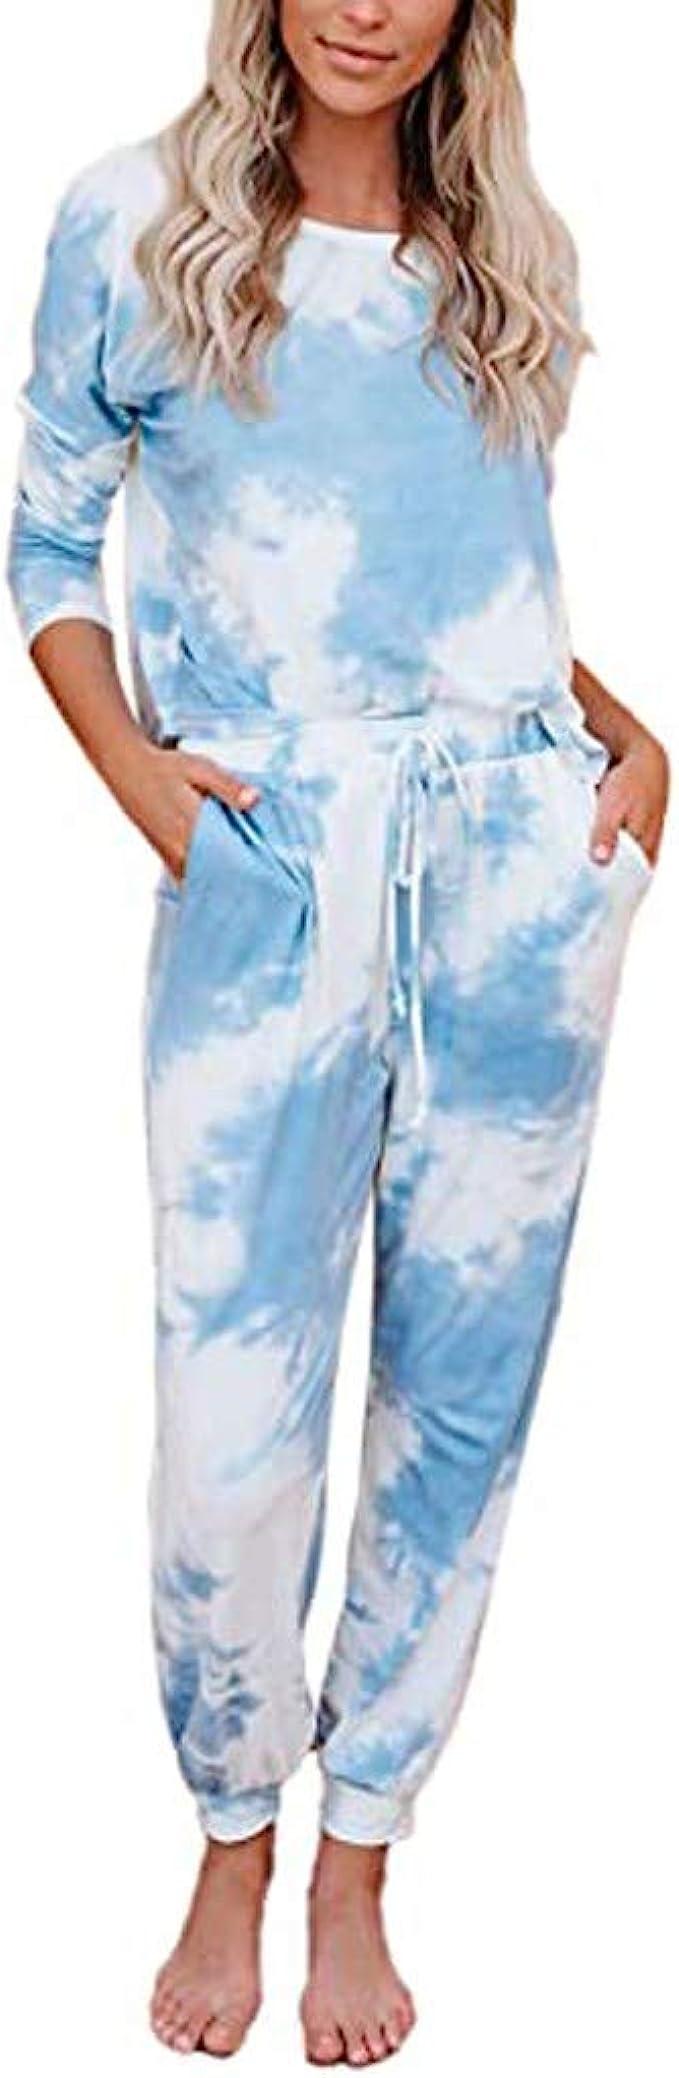 Ladies Women/'s Long Sleeve Tracksuit Lounge-wear Jogging Sweatshirt Pants Set